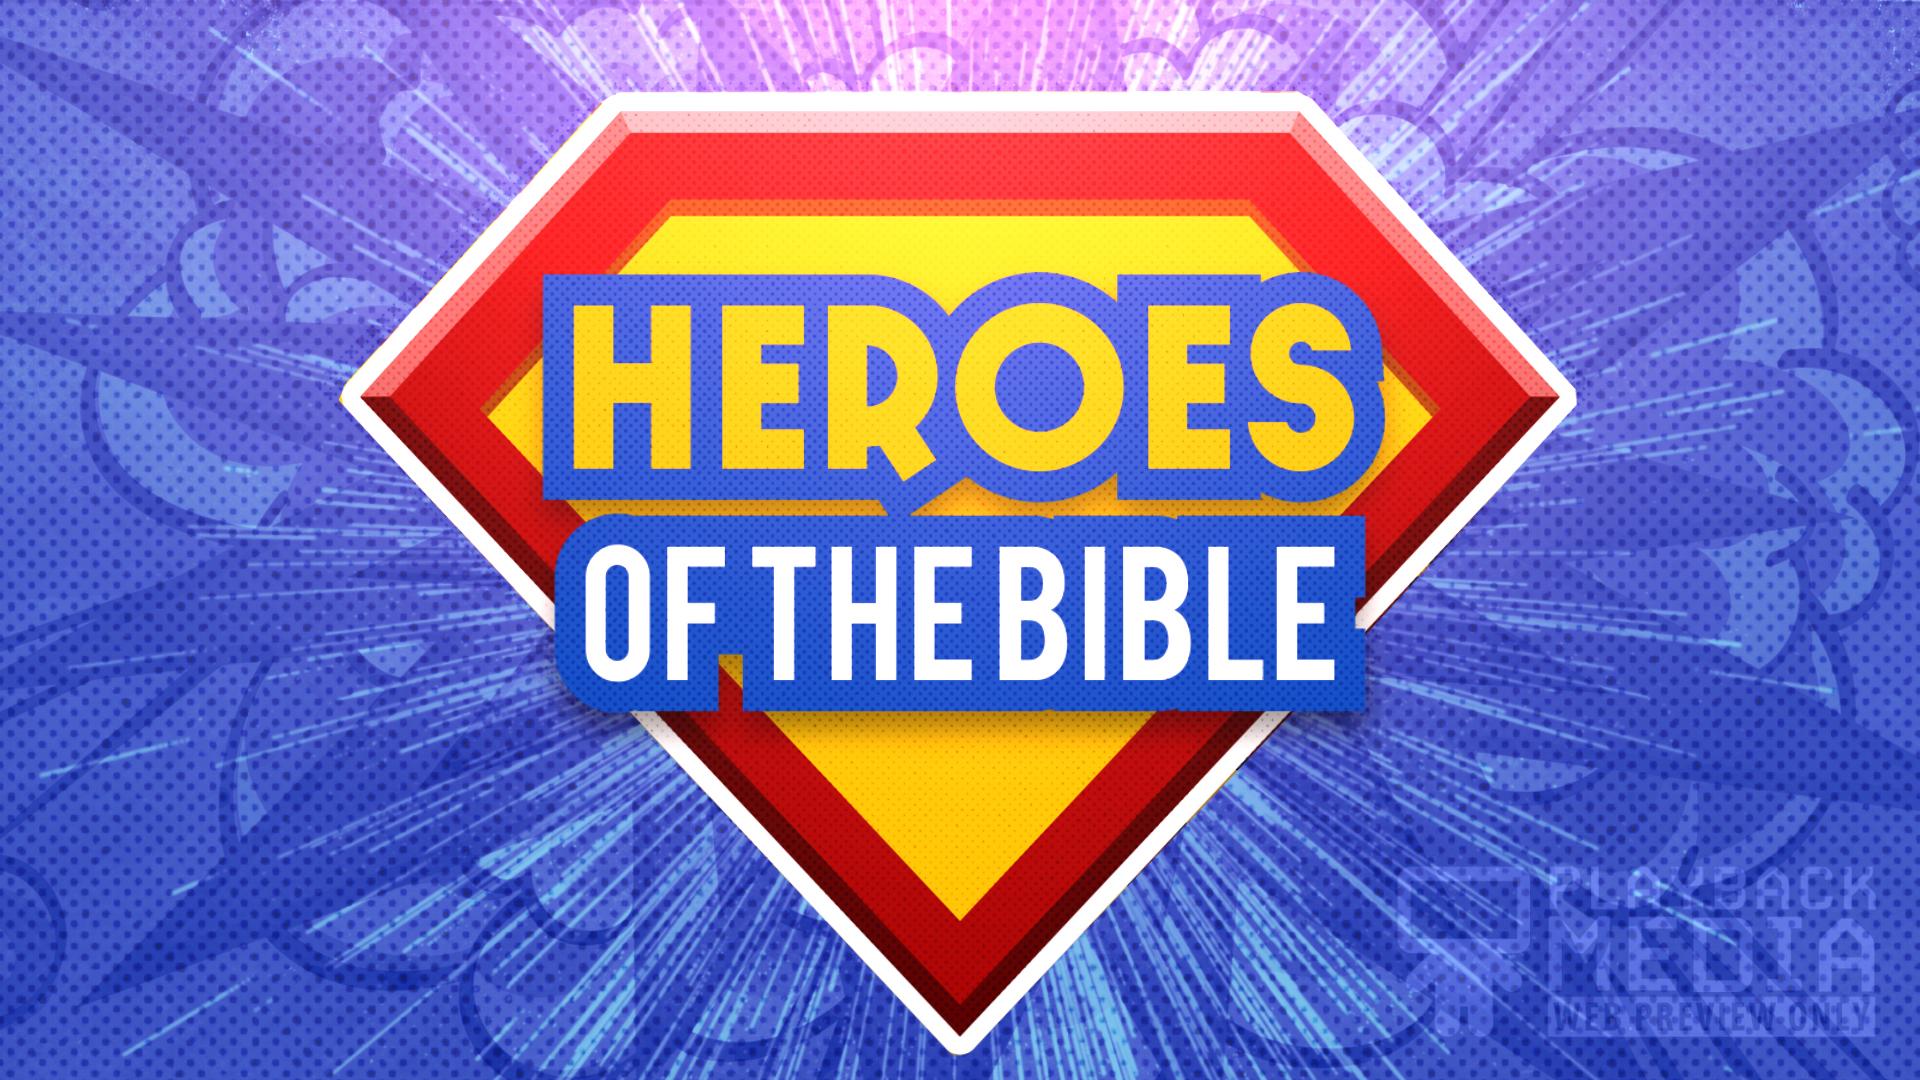 Bible Heroes Hero Motion 1 Image